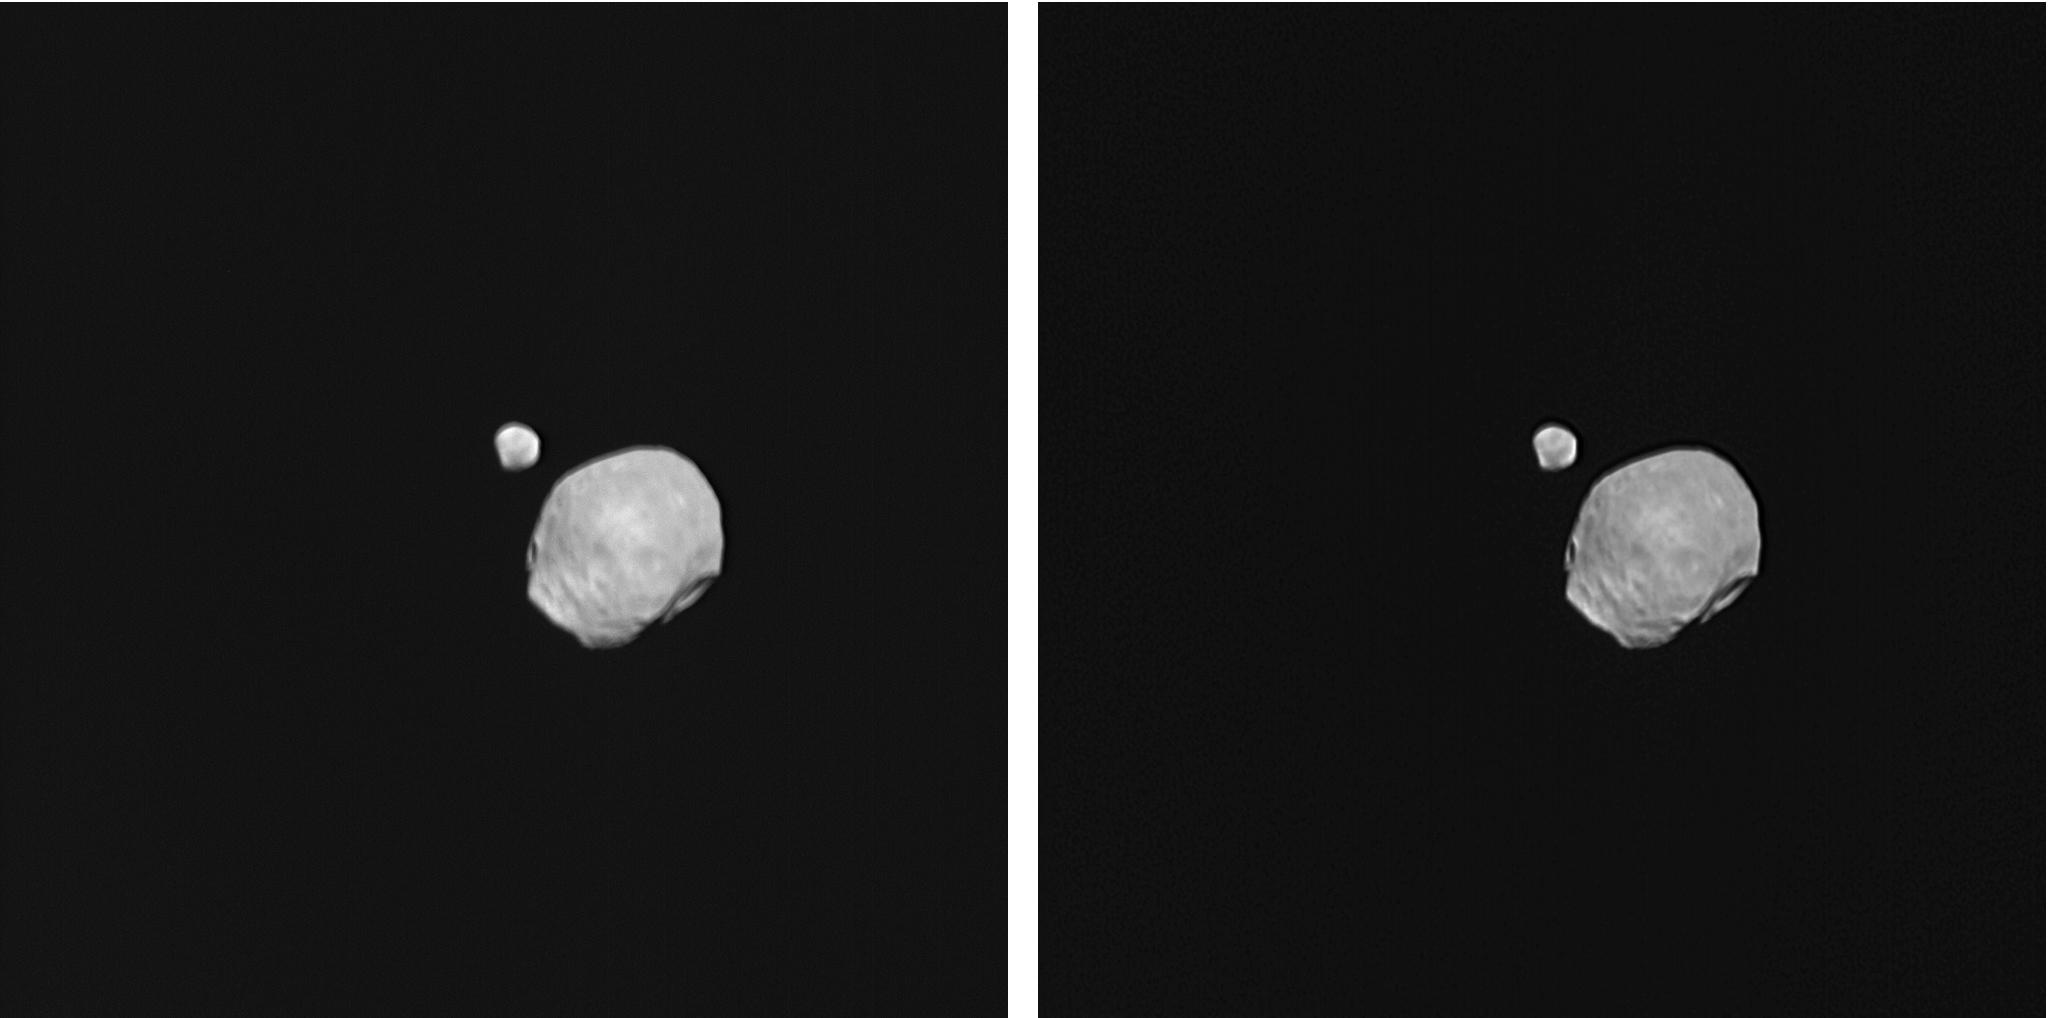 moons of mars both - photo #15